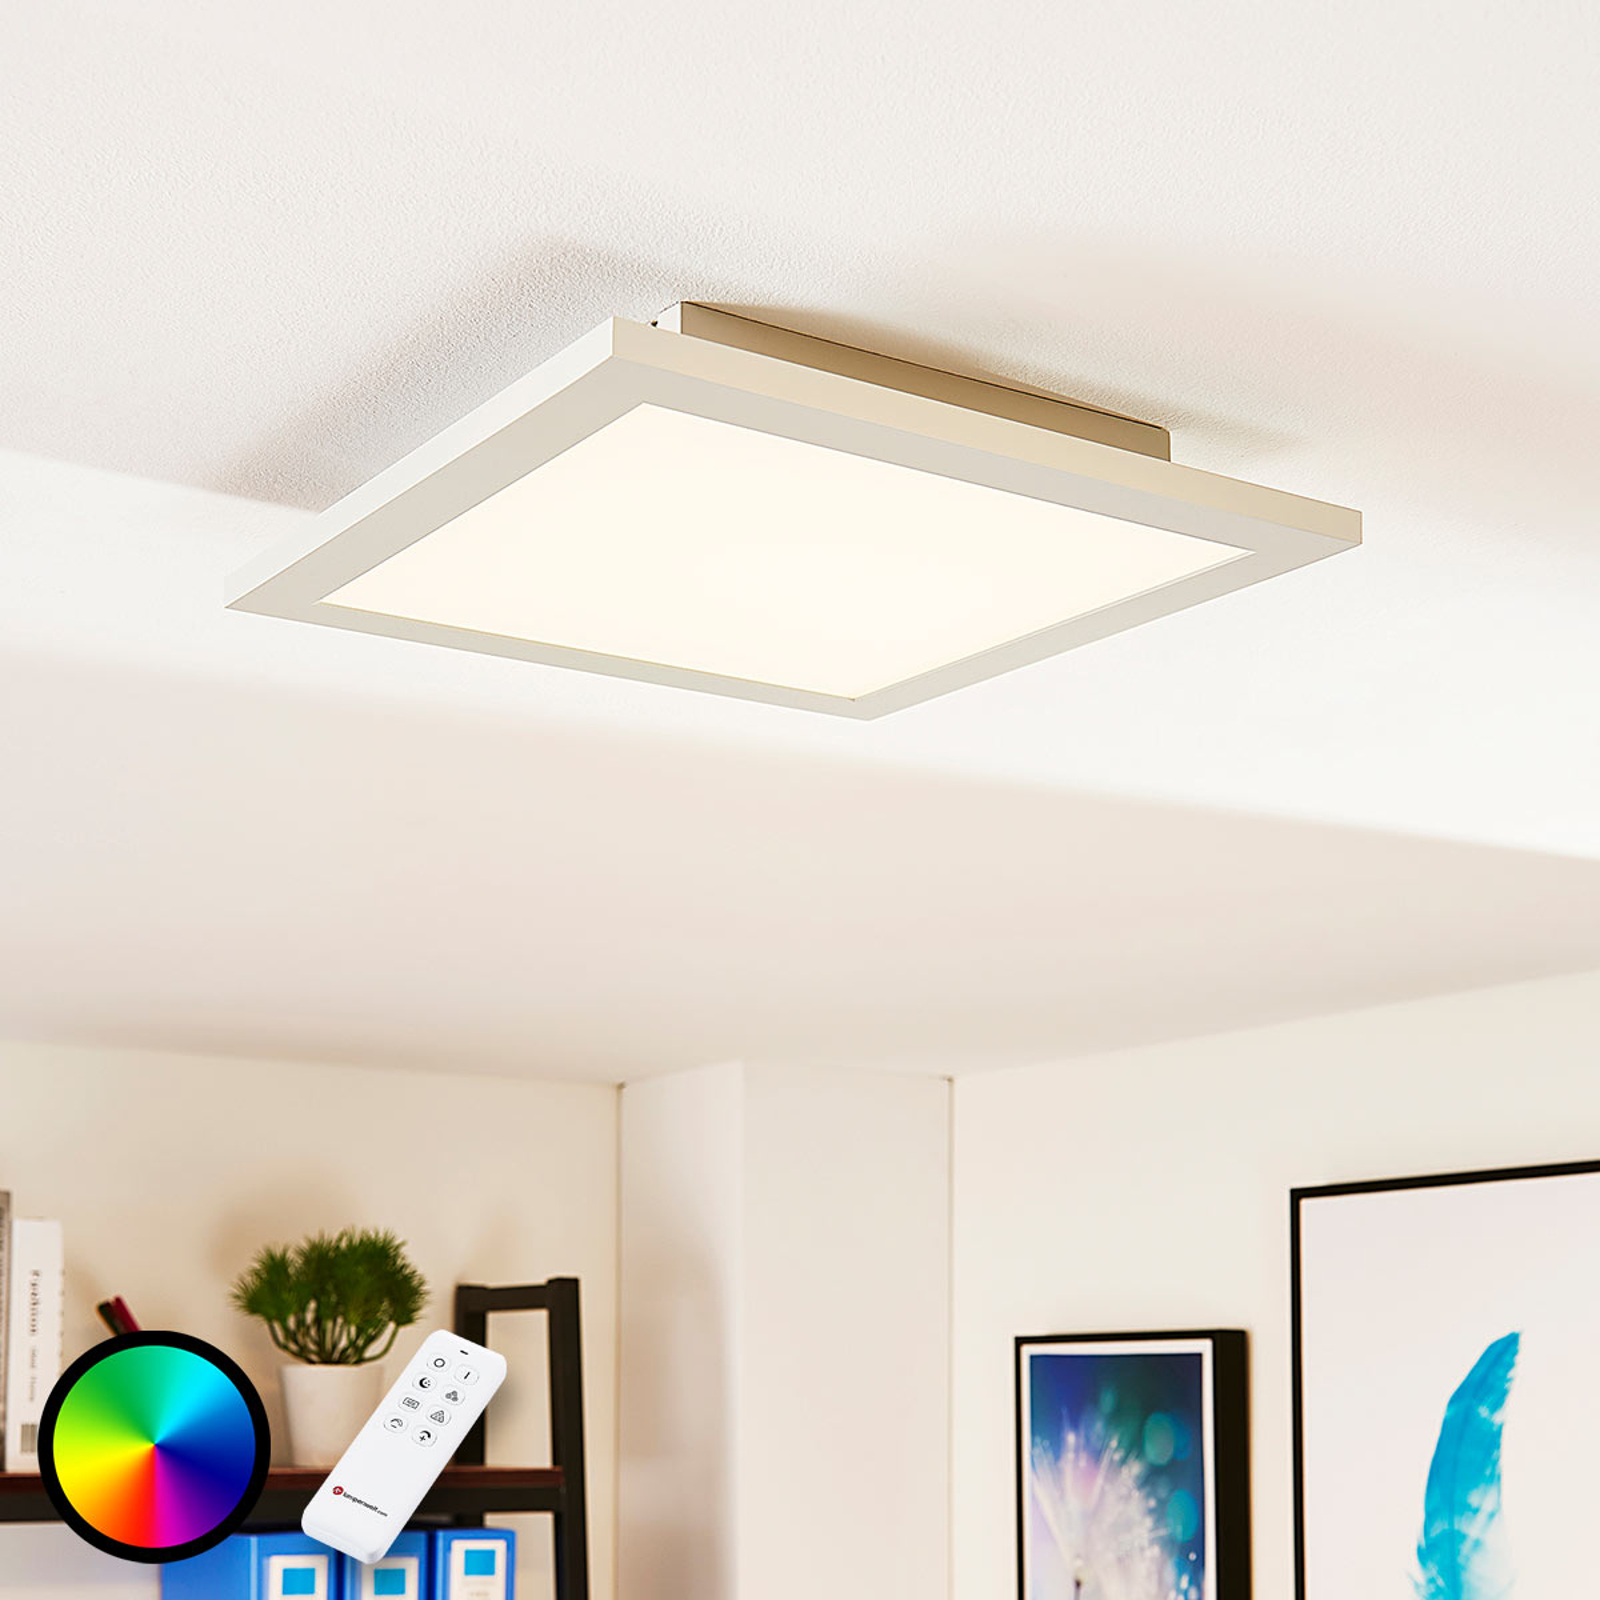 Square LED panel Tinus, RGB and warm white_9621651_1